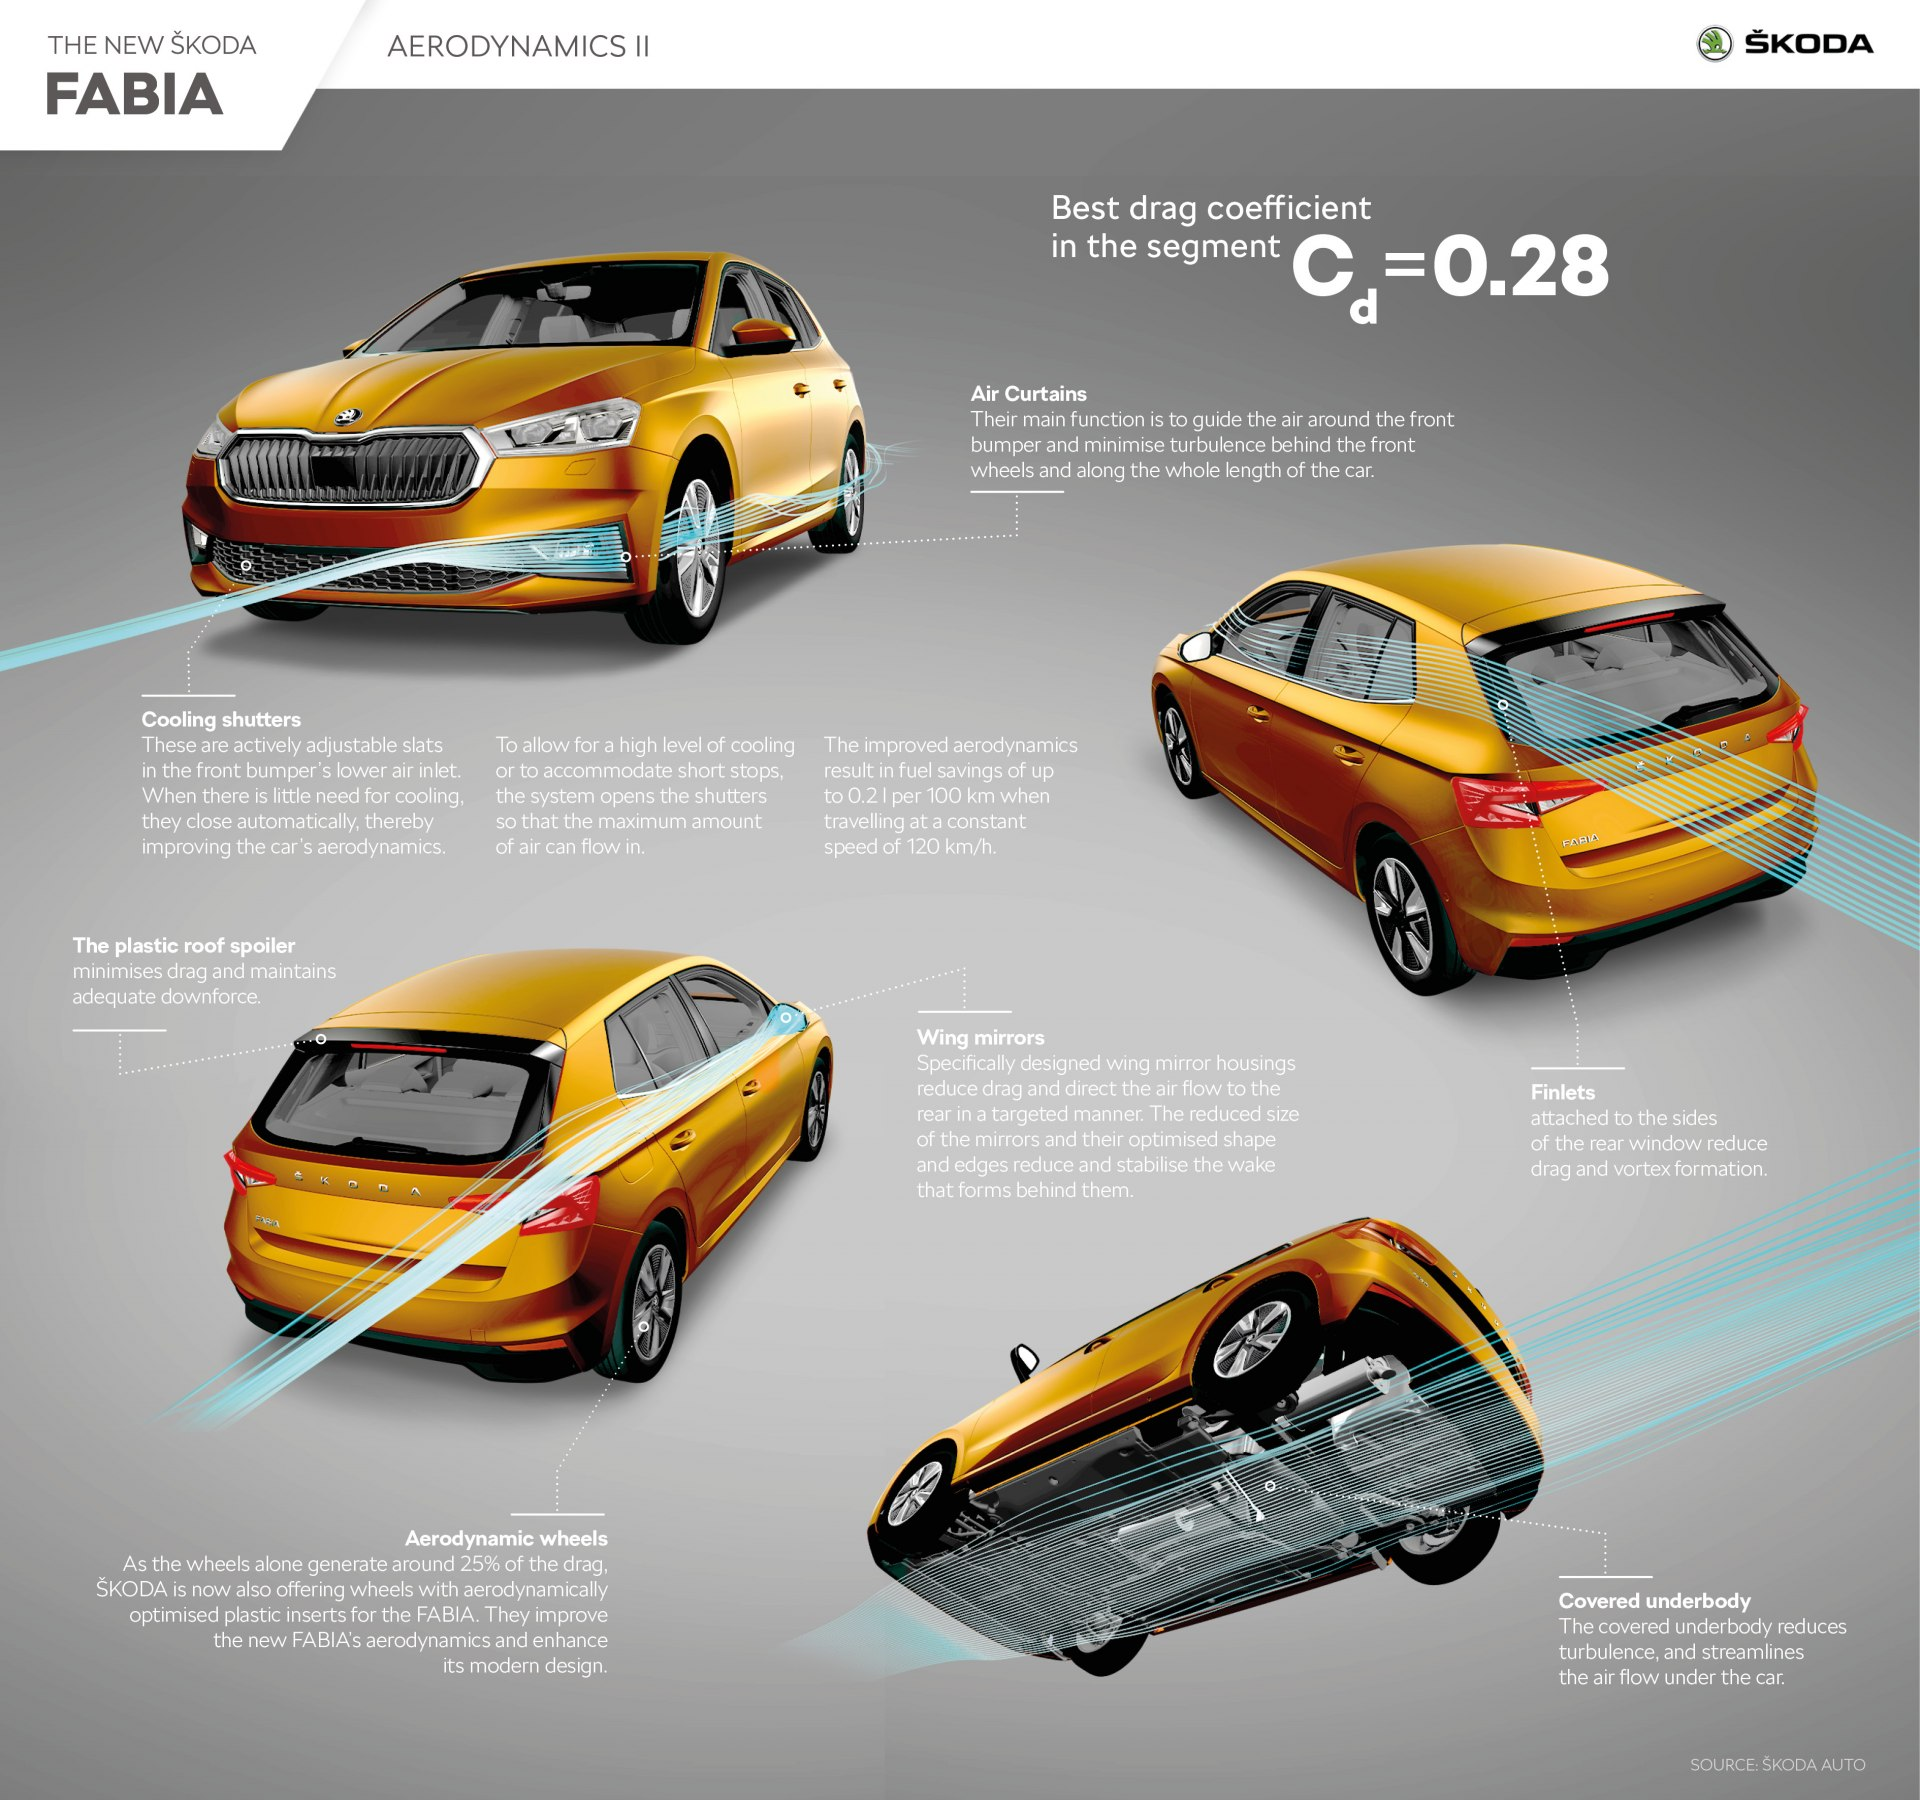 skoda_fabia_aerodynamics_ii-1920x1800.jpg